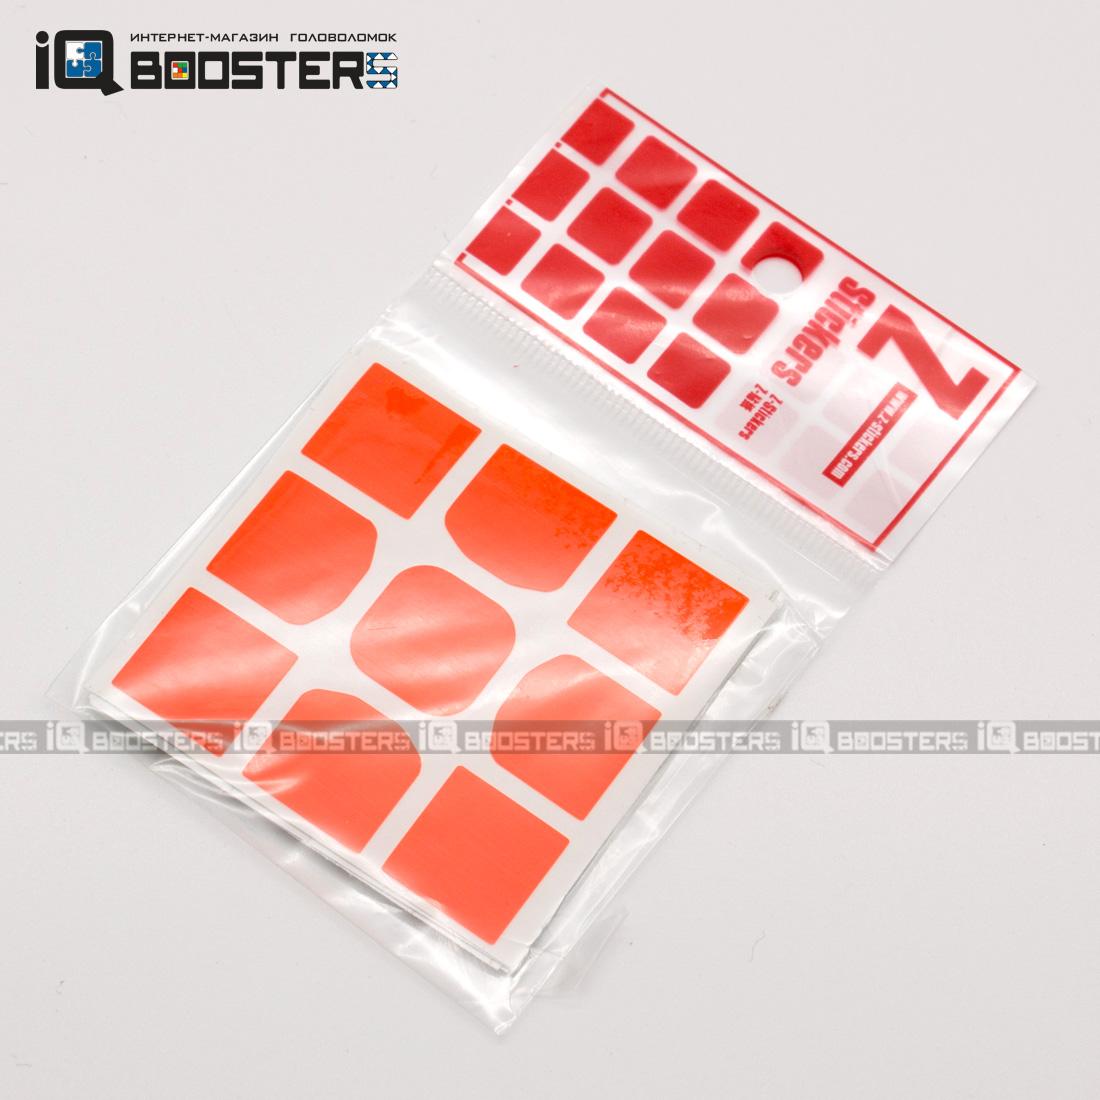 z-stickers_valk3_ff_hb_2